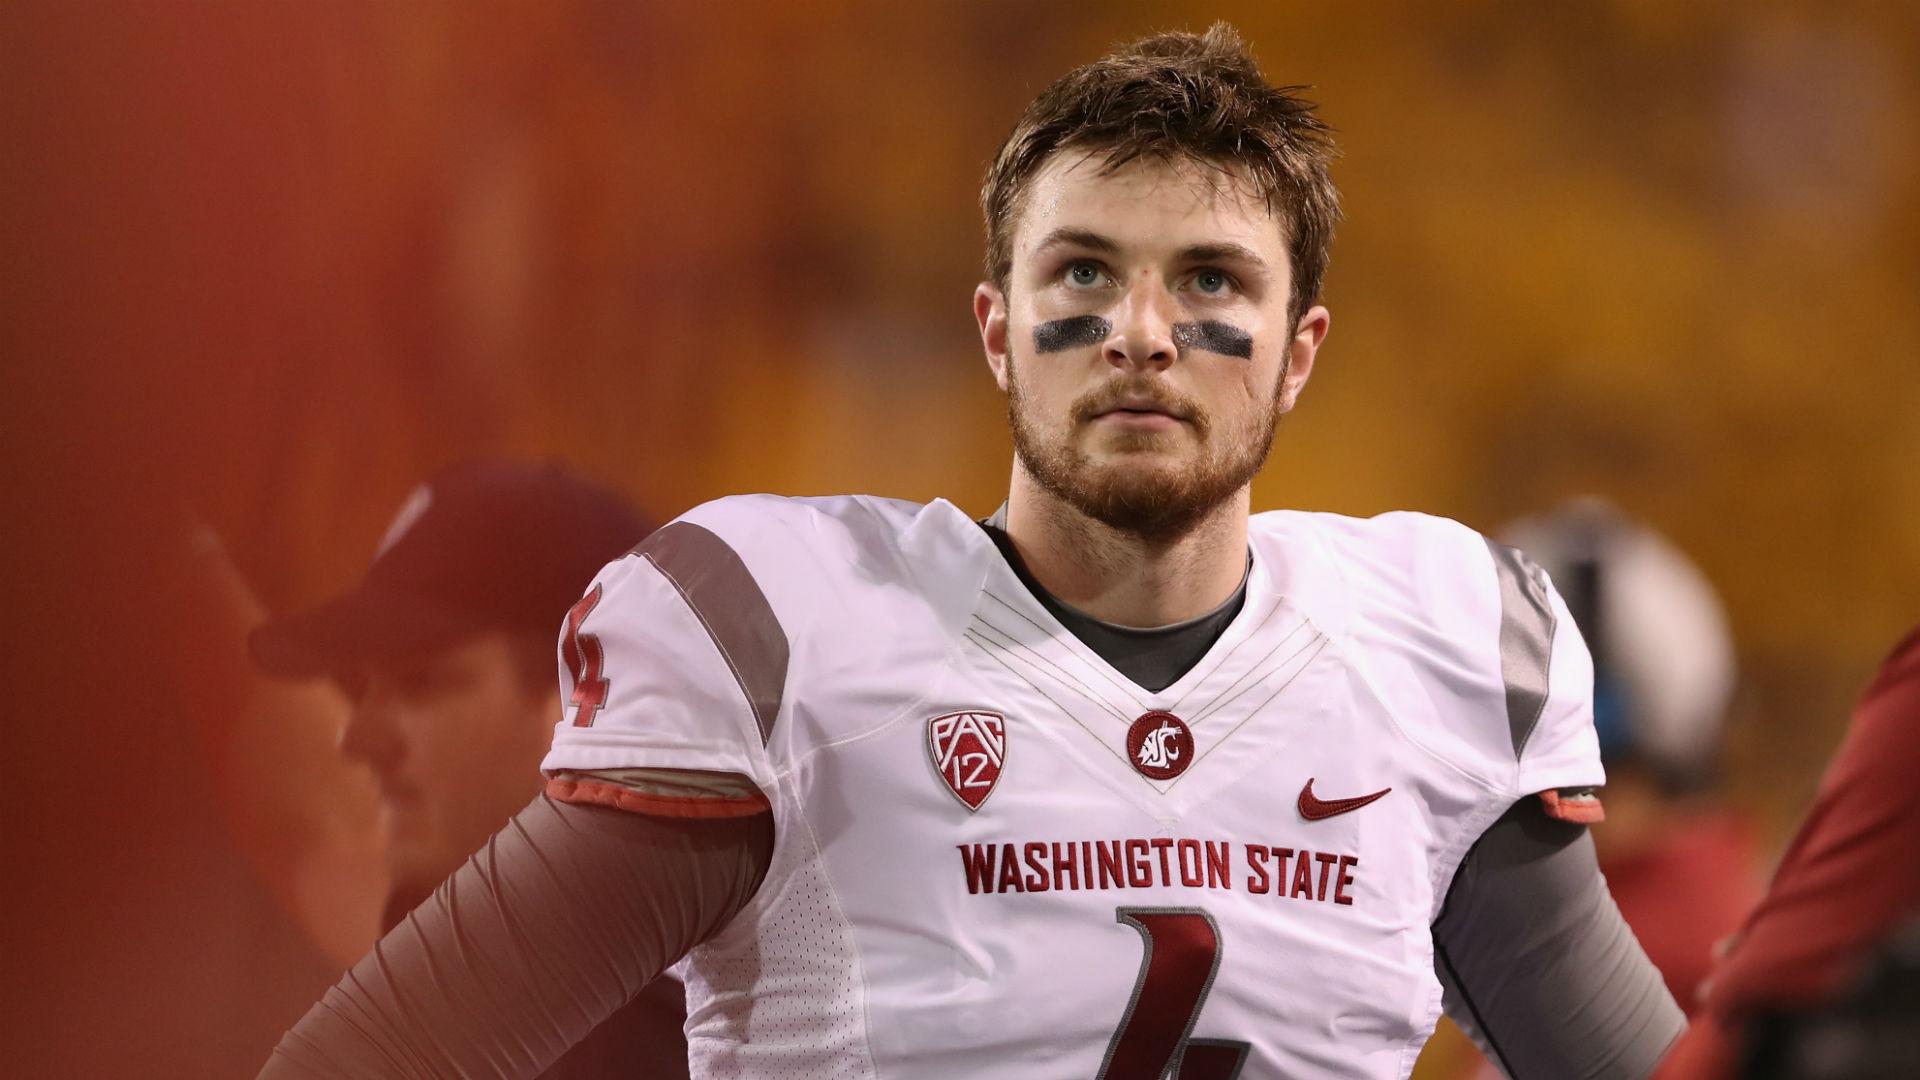 Other | Luke Falk returning to Washington State in 2017 ...